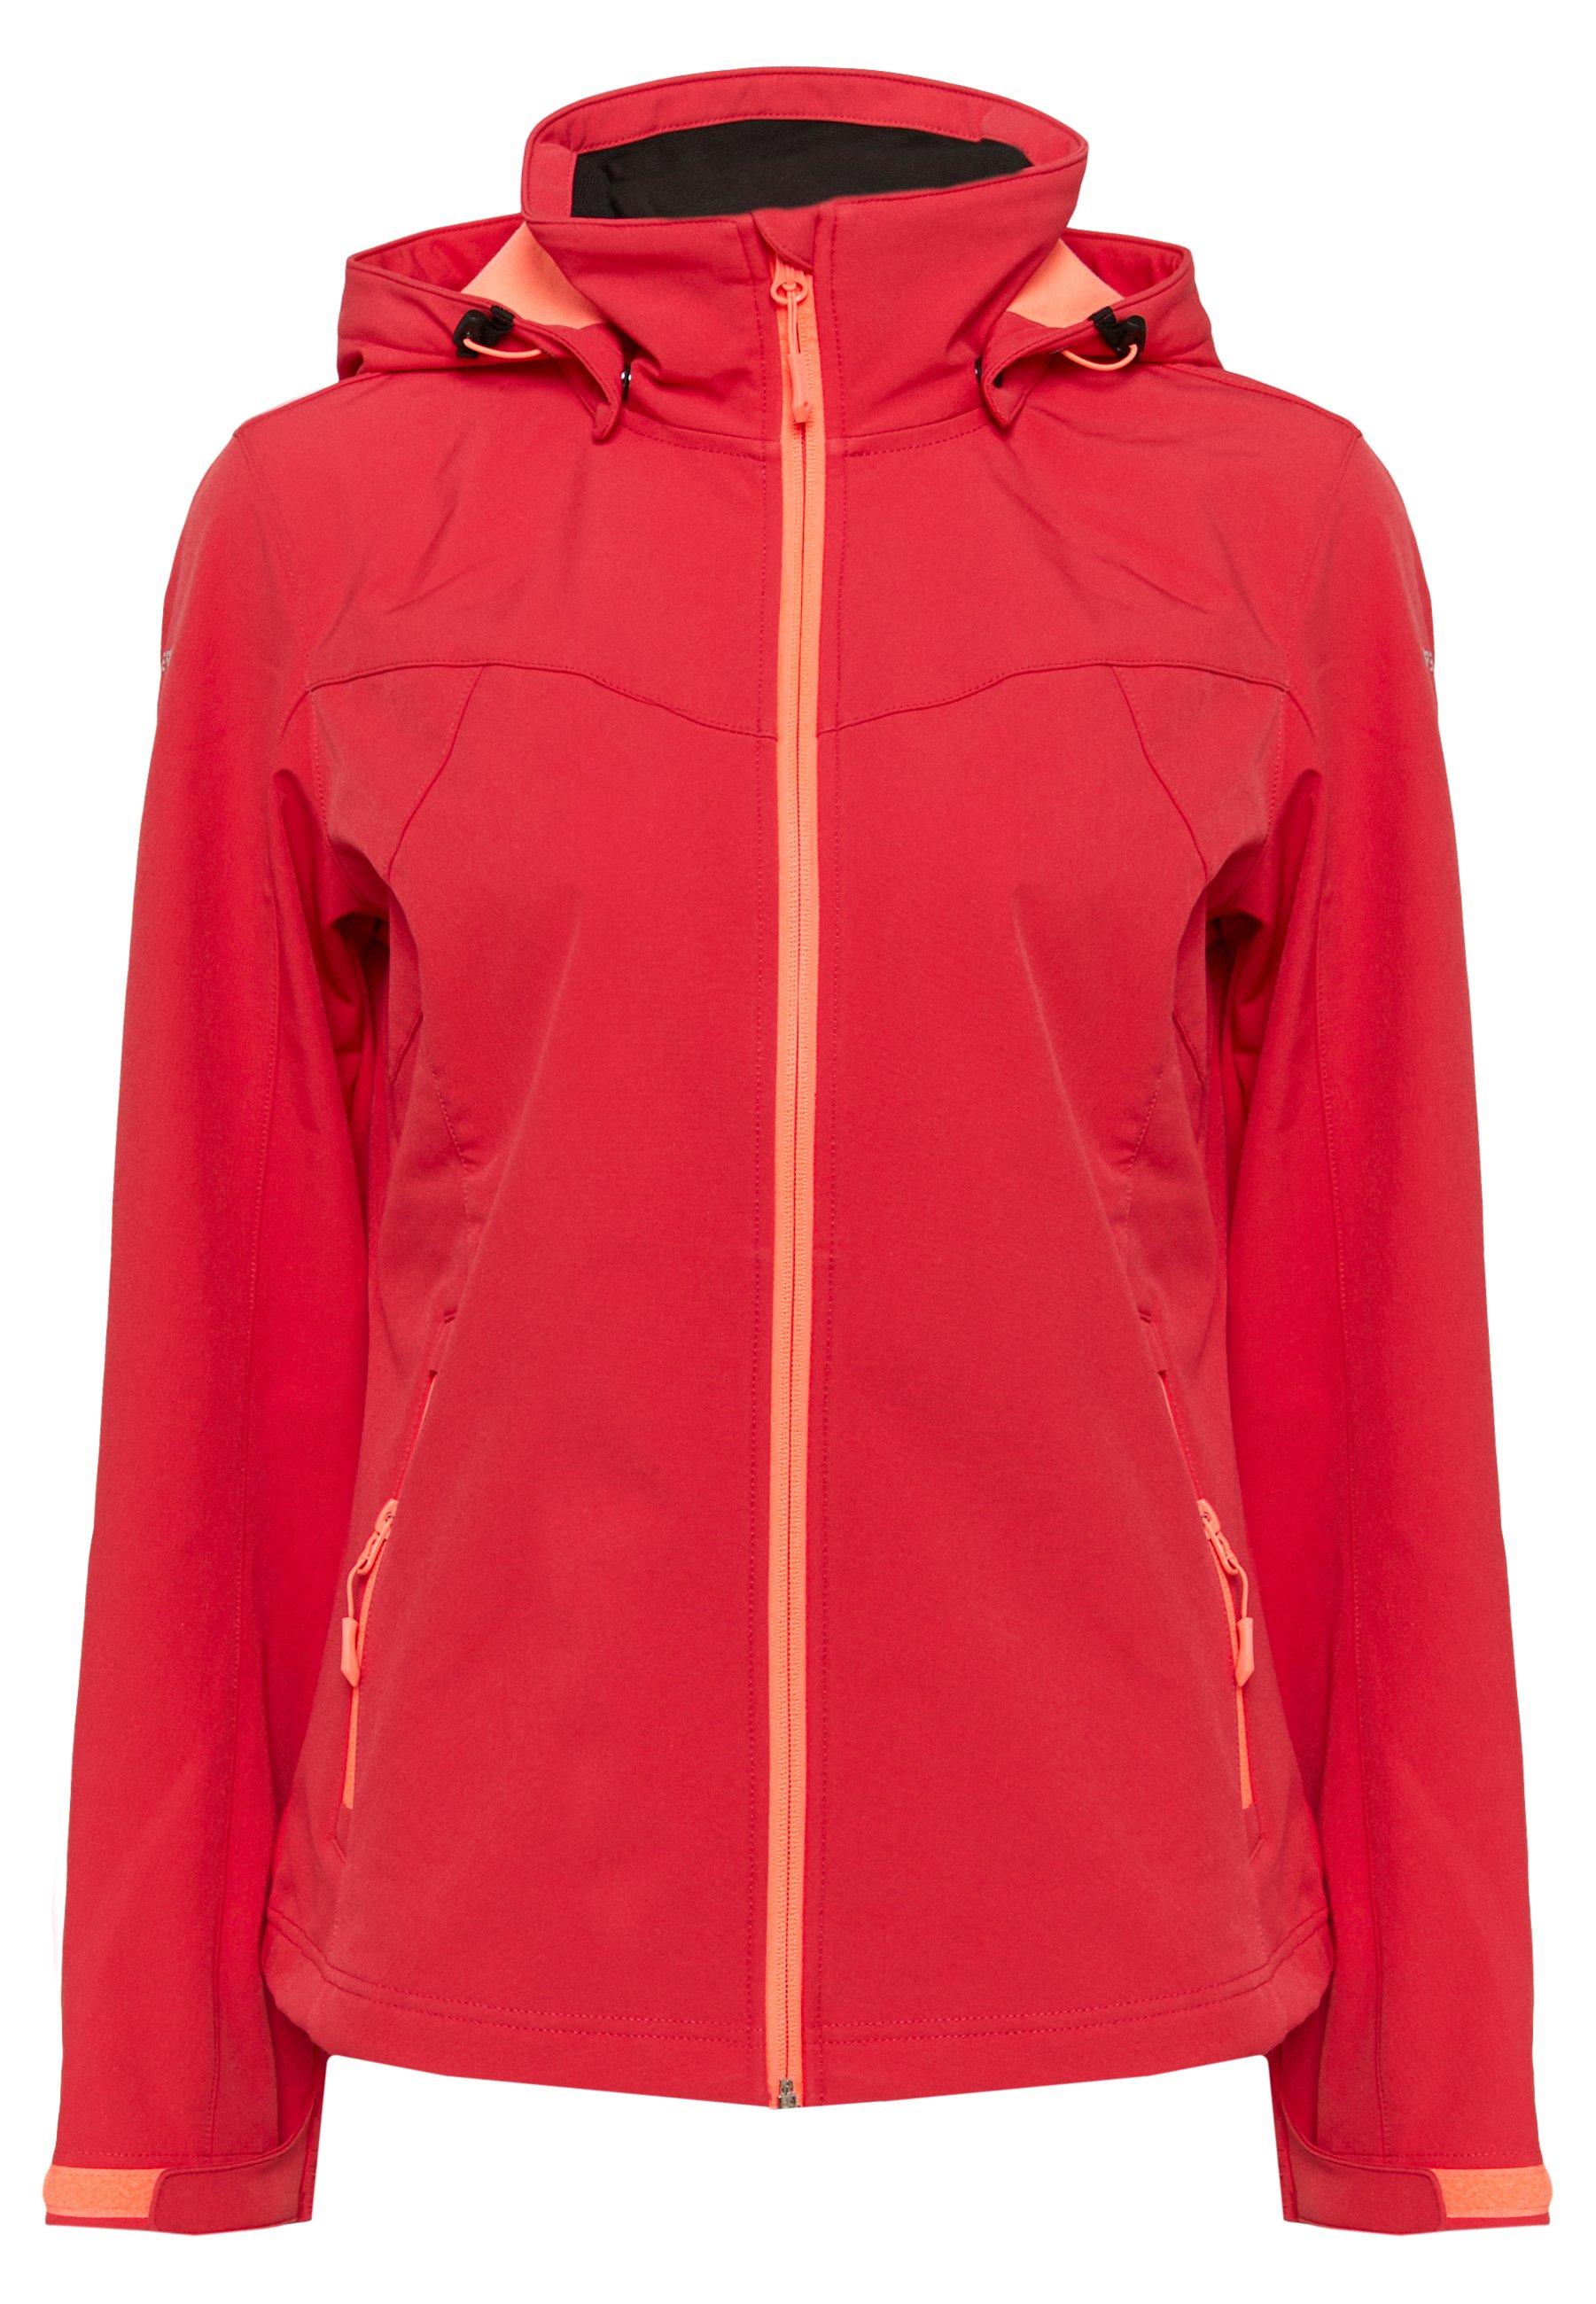 BOISE Softshell jakker coral red